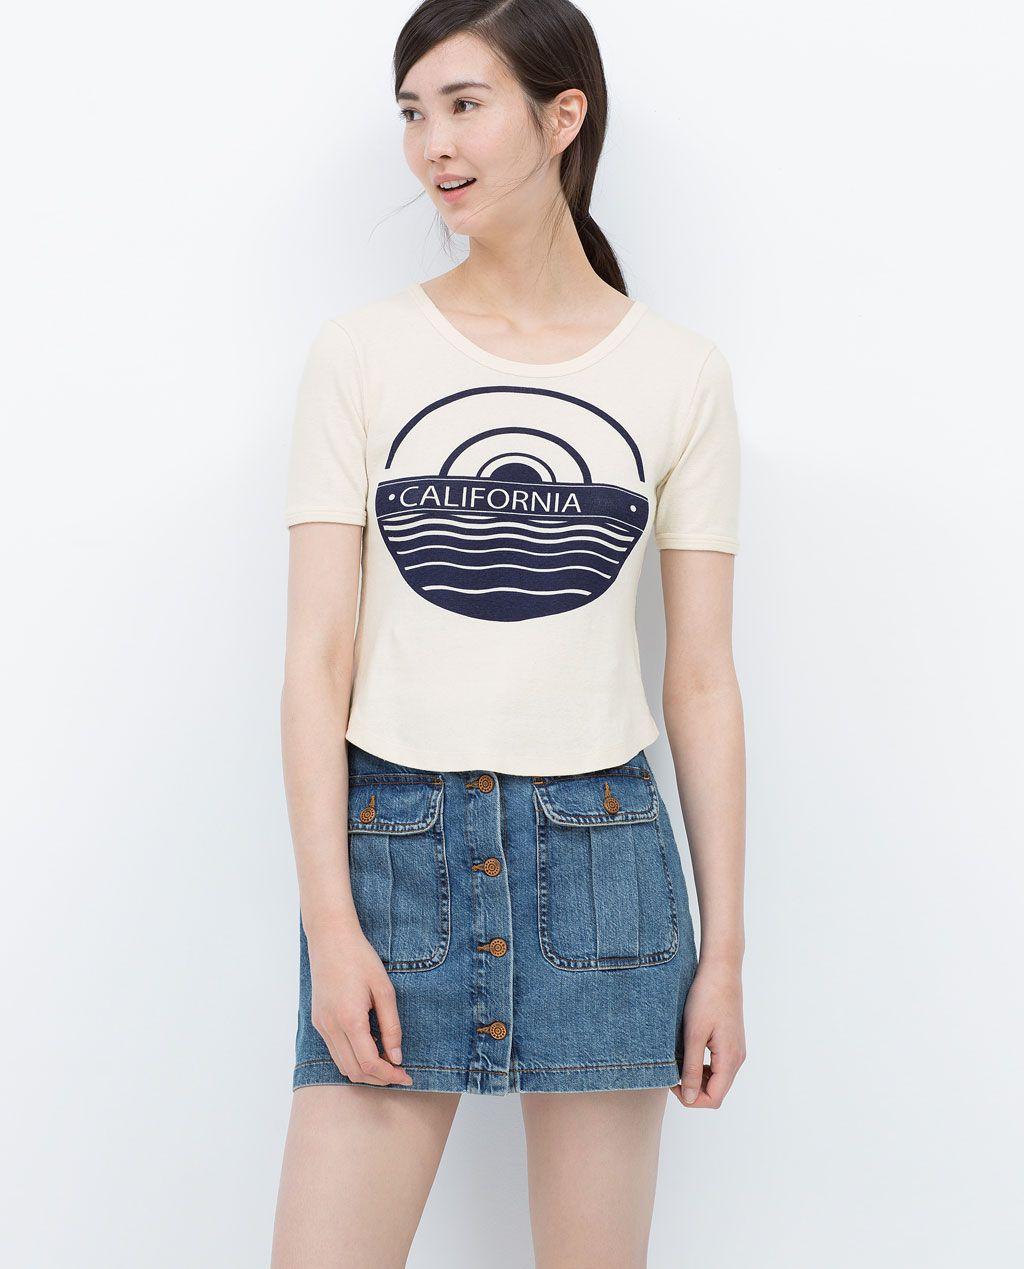 Zara Trf Printed T Shirt Tshirts For Work Pinterest T